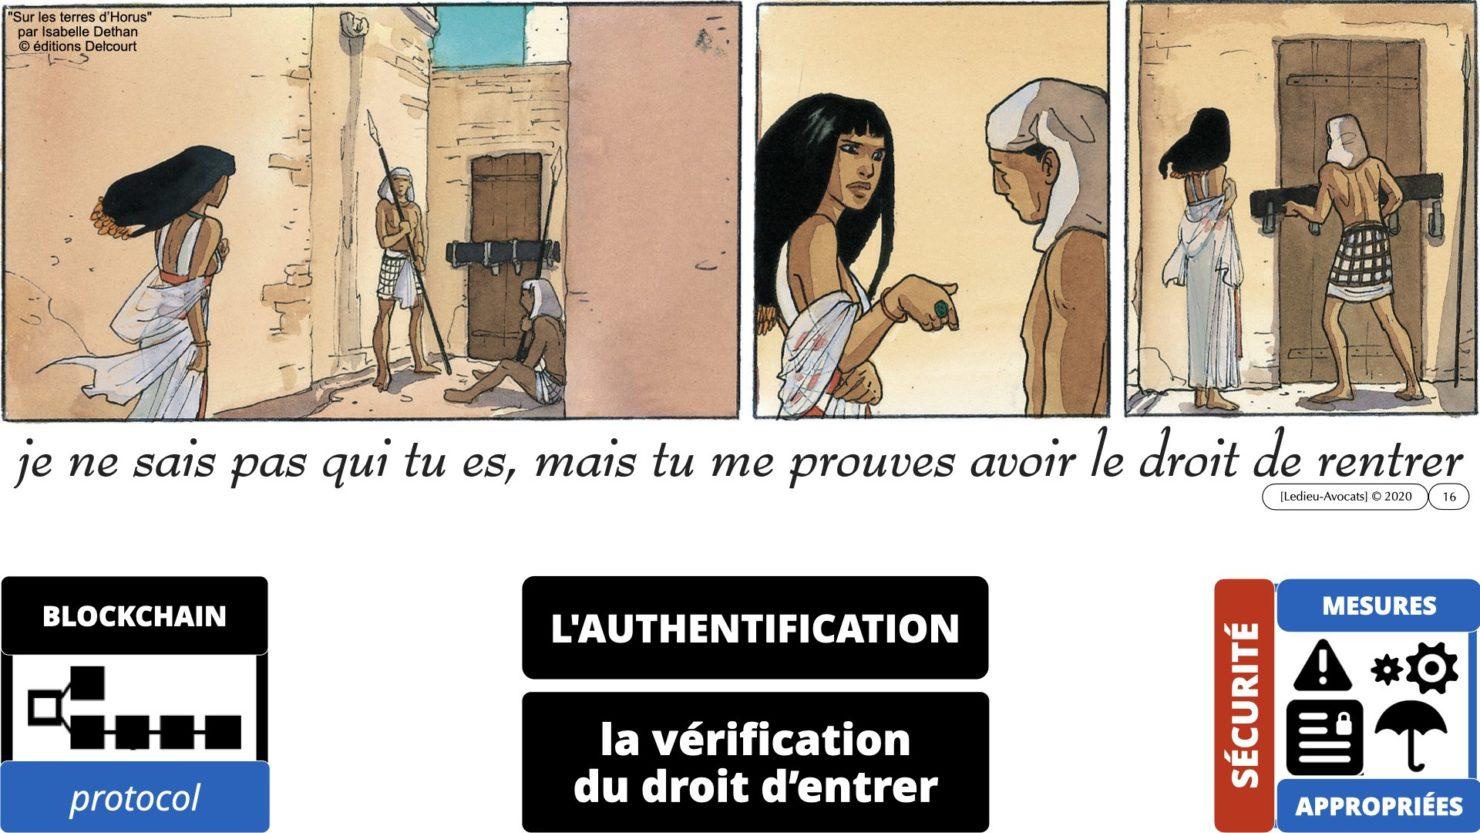 339 référentiel ANSSI PVID podcast NoLimitSecu #326 du 28 juin 2021 © Ledieu-Avocats.016